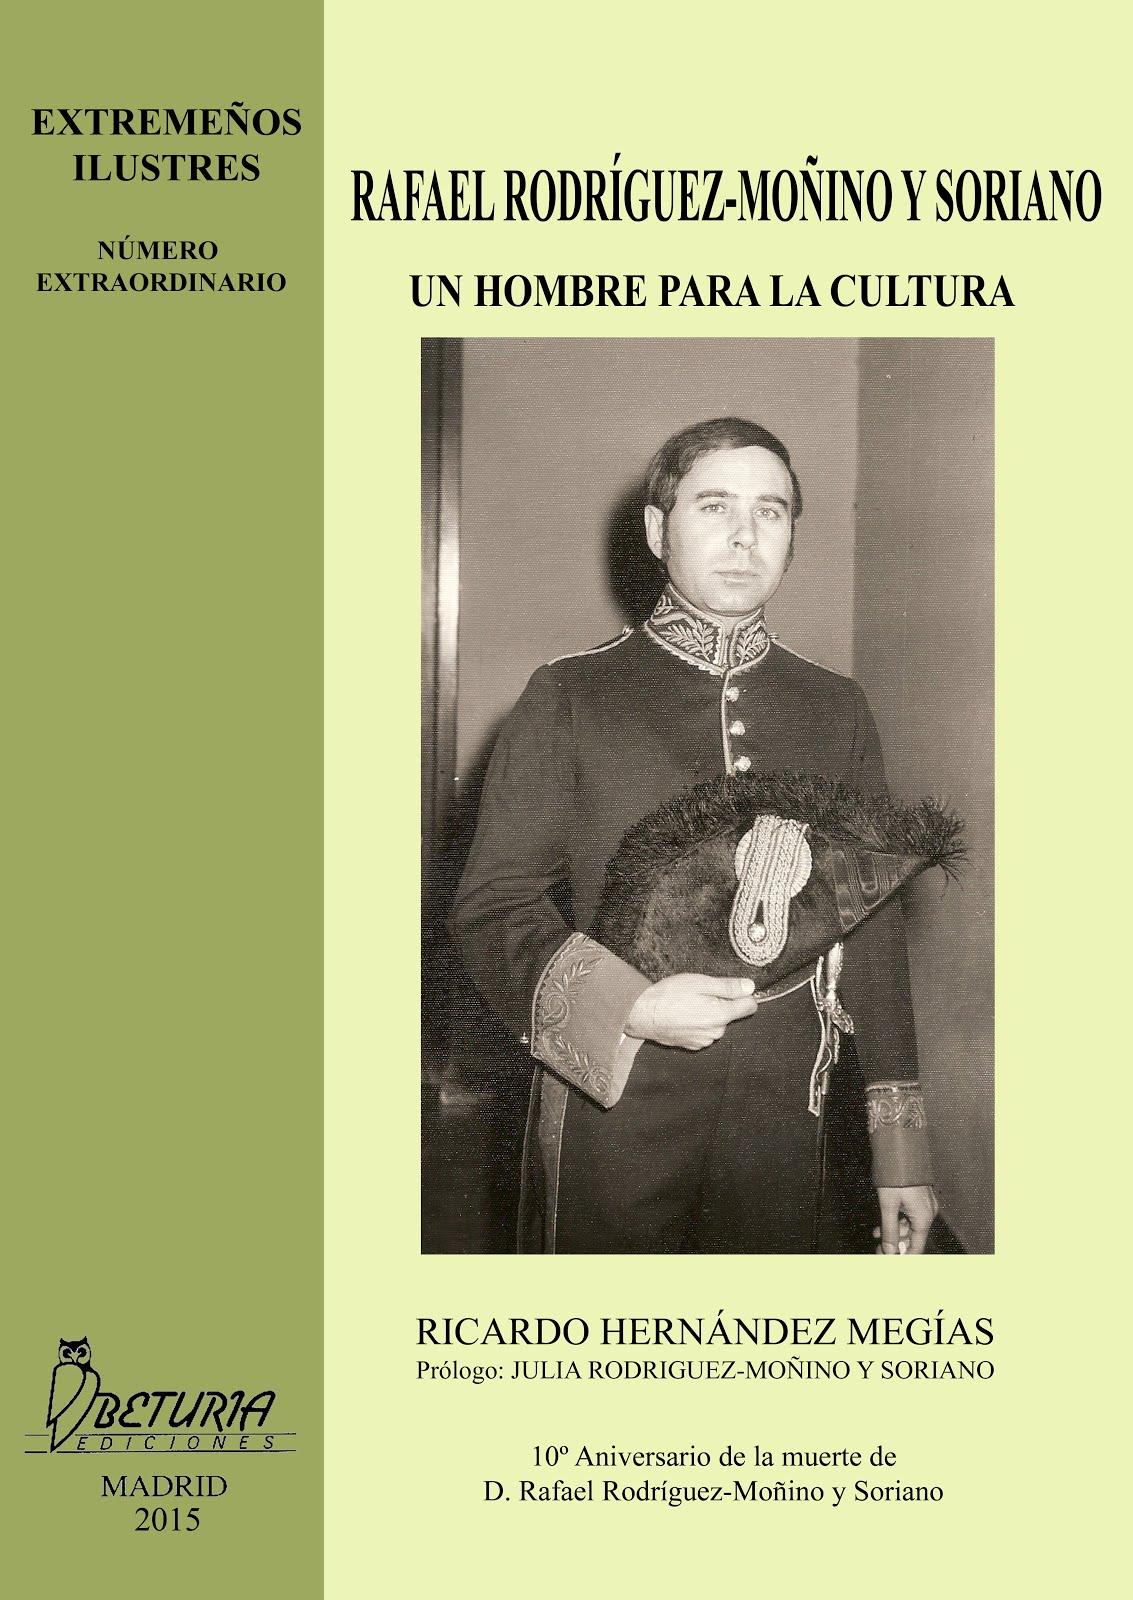 Rafael Rodríguez-Moñino